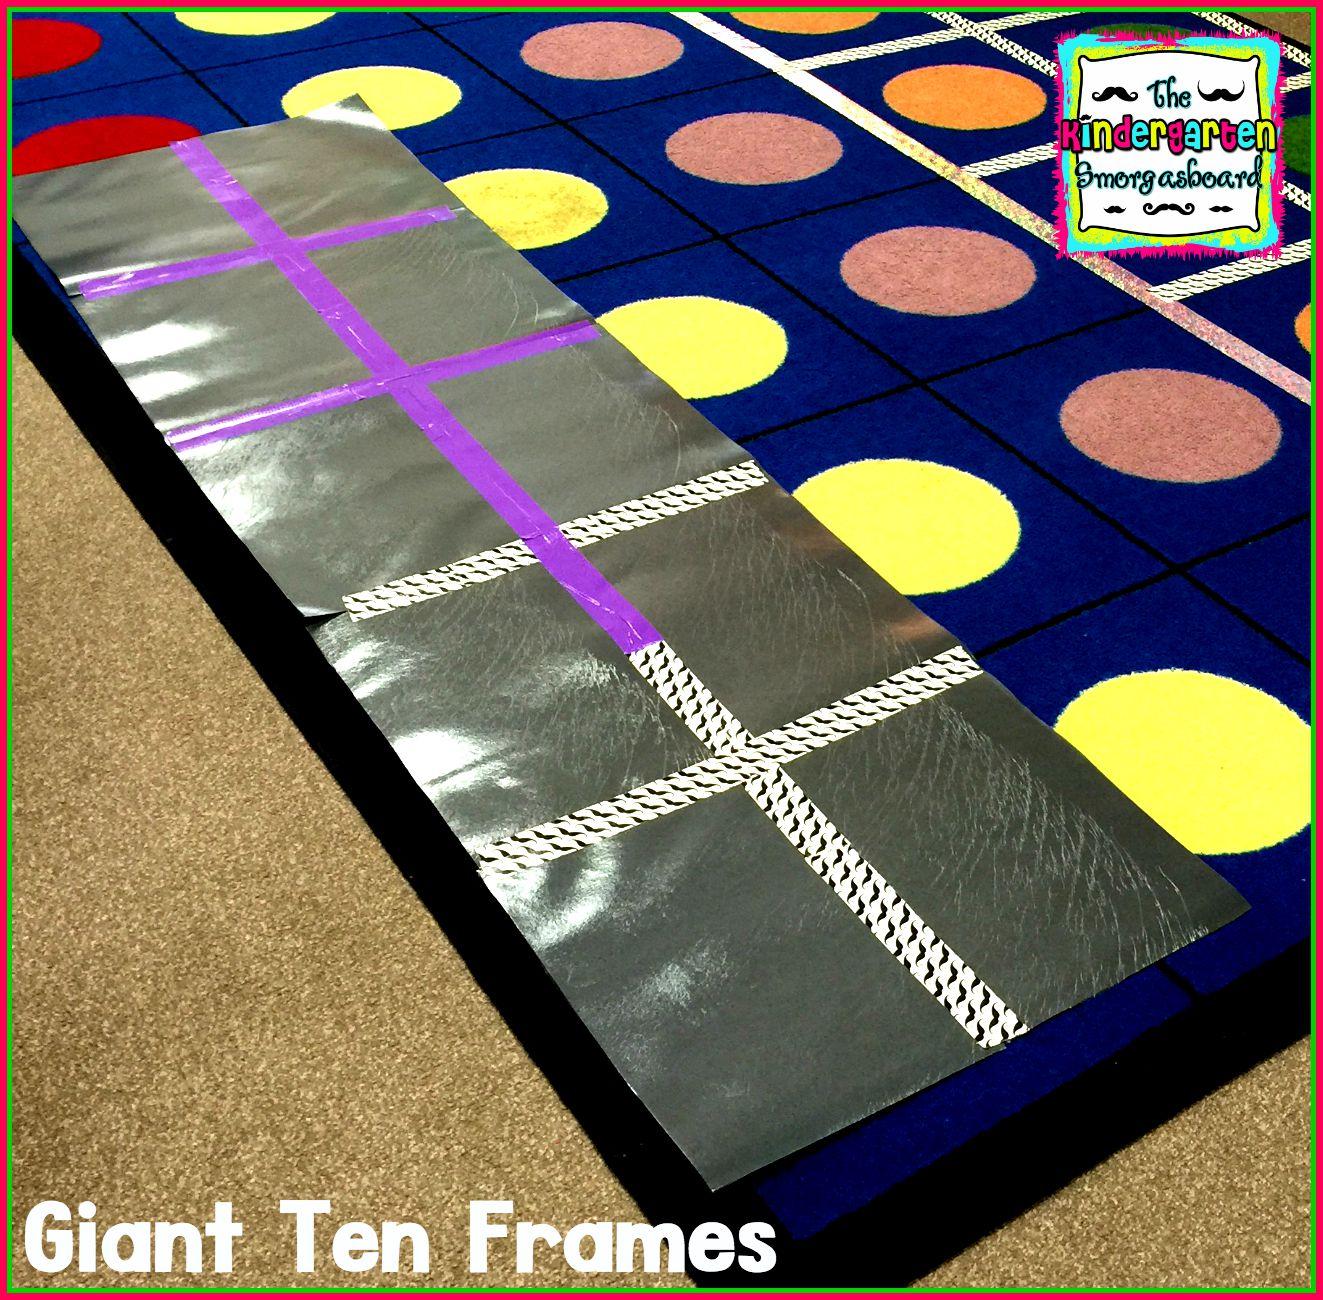 The Kindergarten Smorgasboard A Kindergarten Smorgasboard Of Counting With Ten Frames